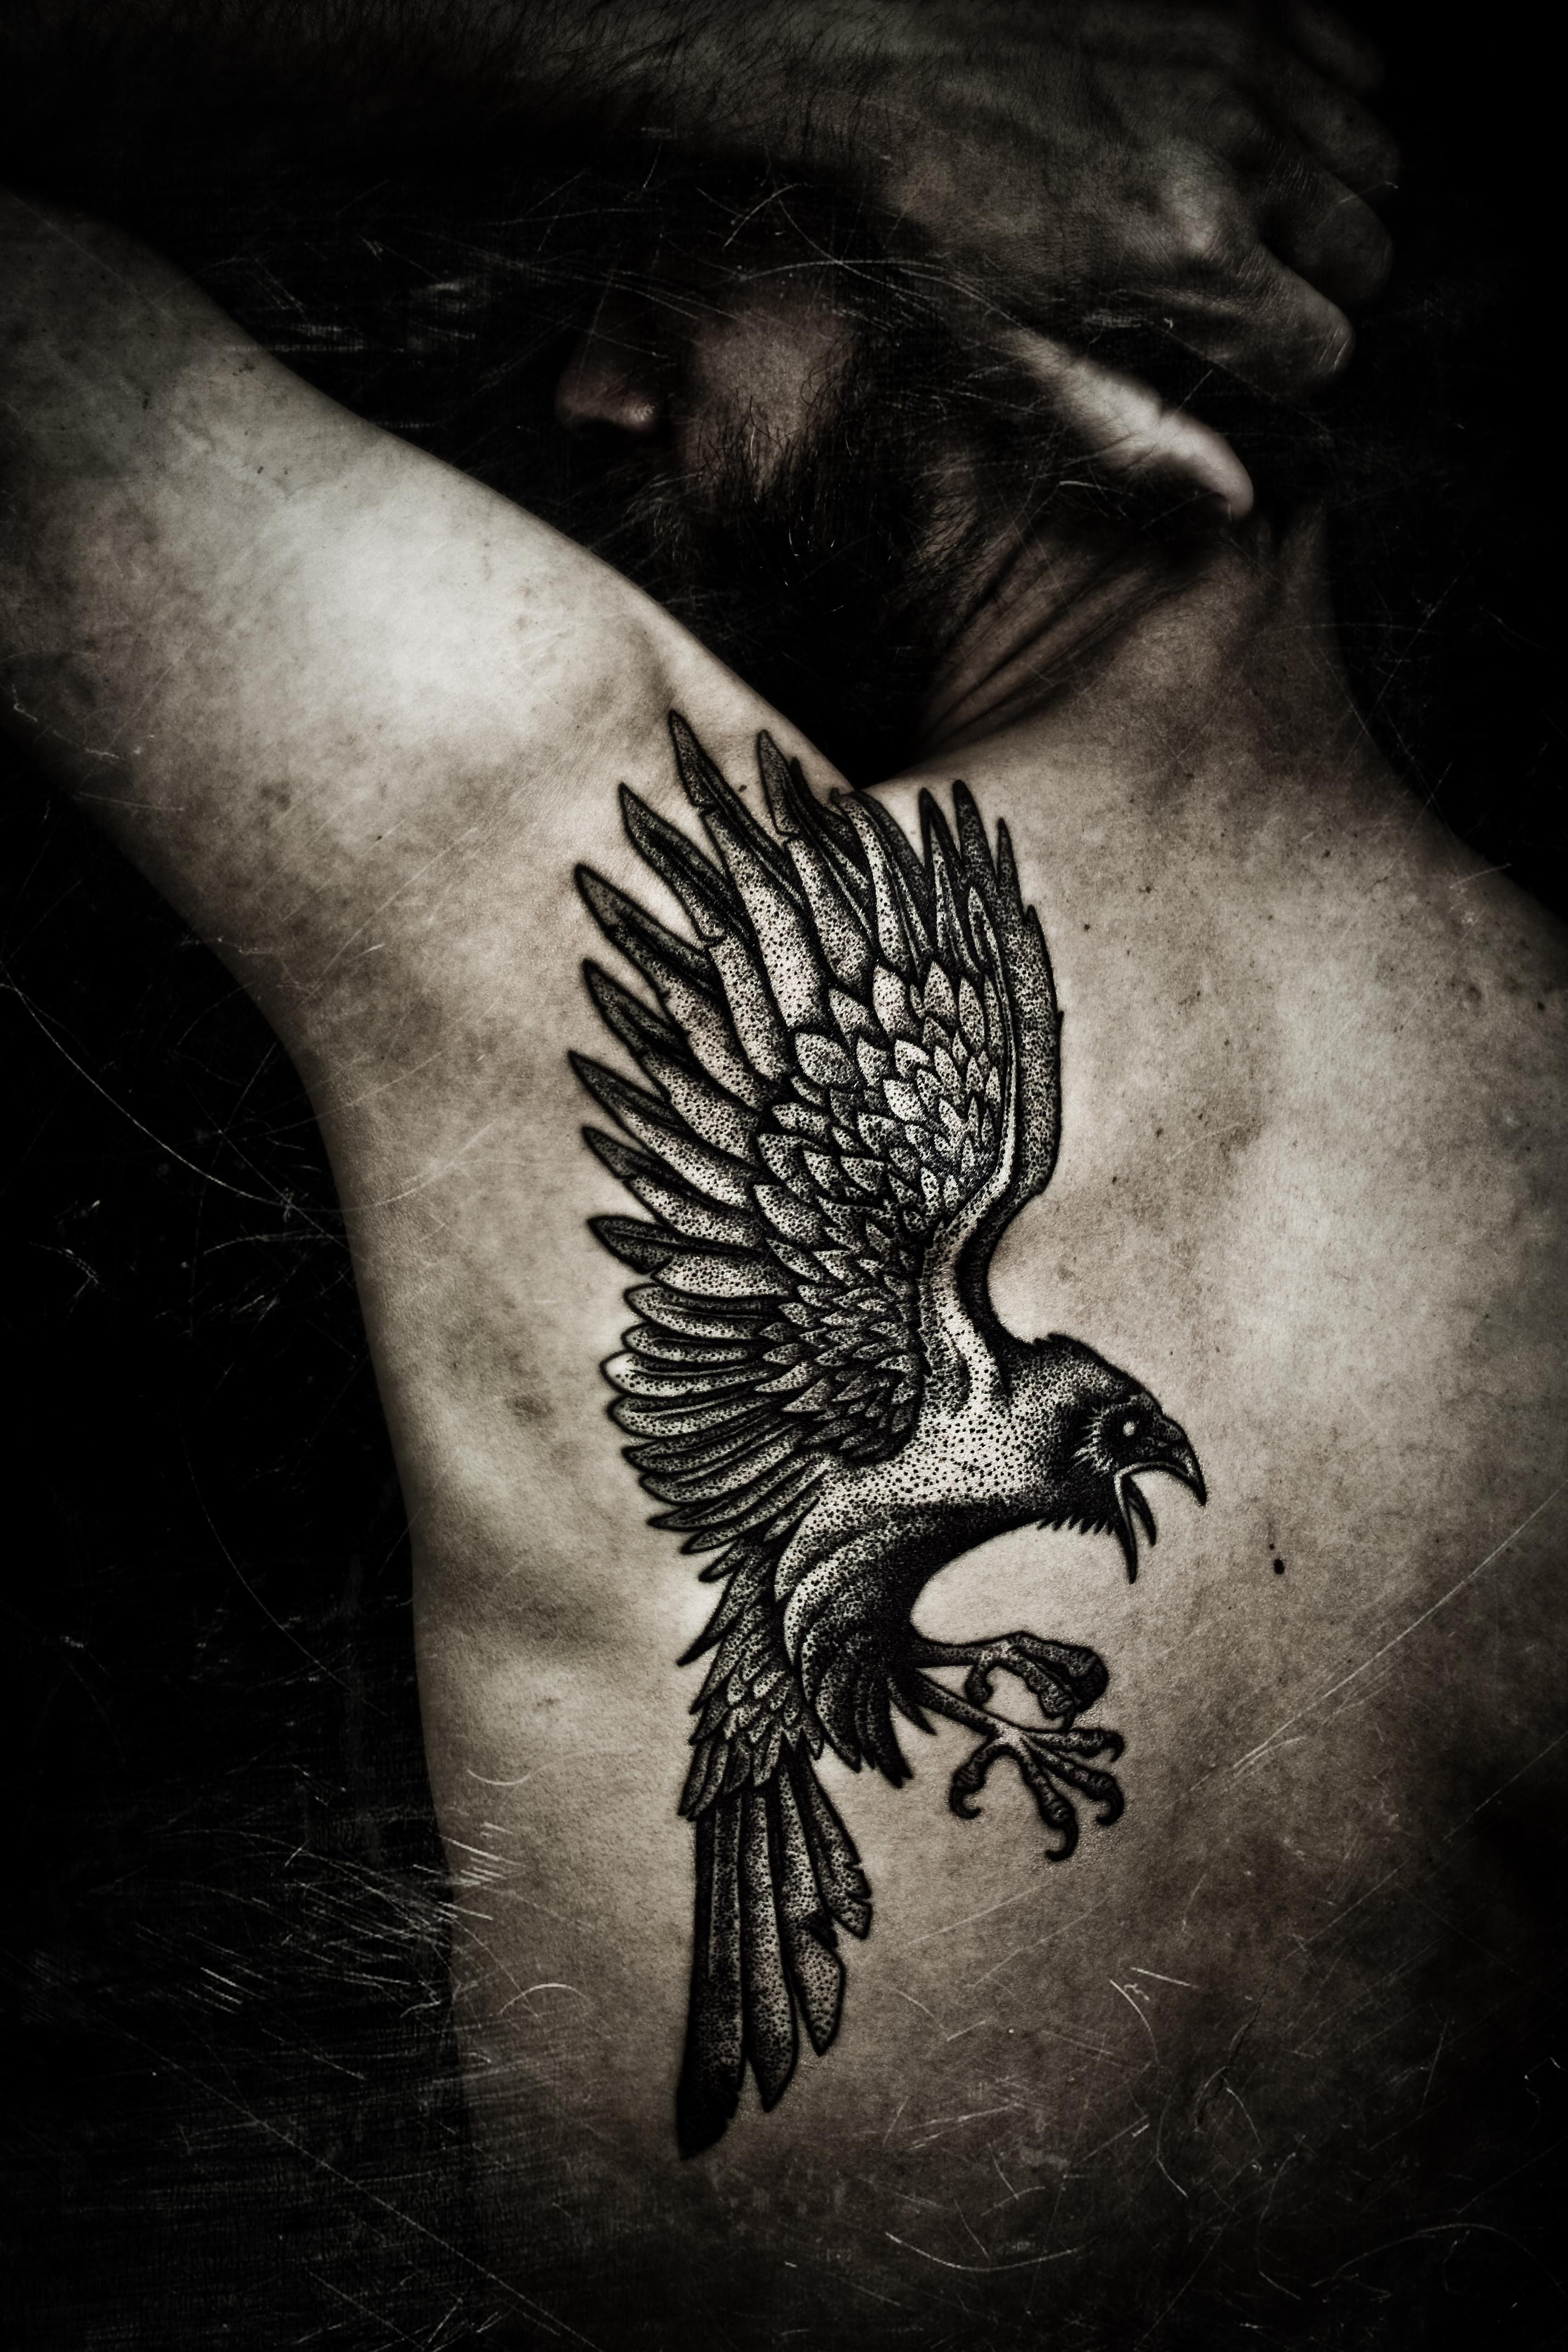 The Raven, pro-photo by Meatshop-Tattoo on DeviantArt